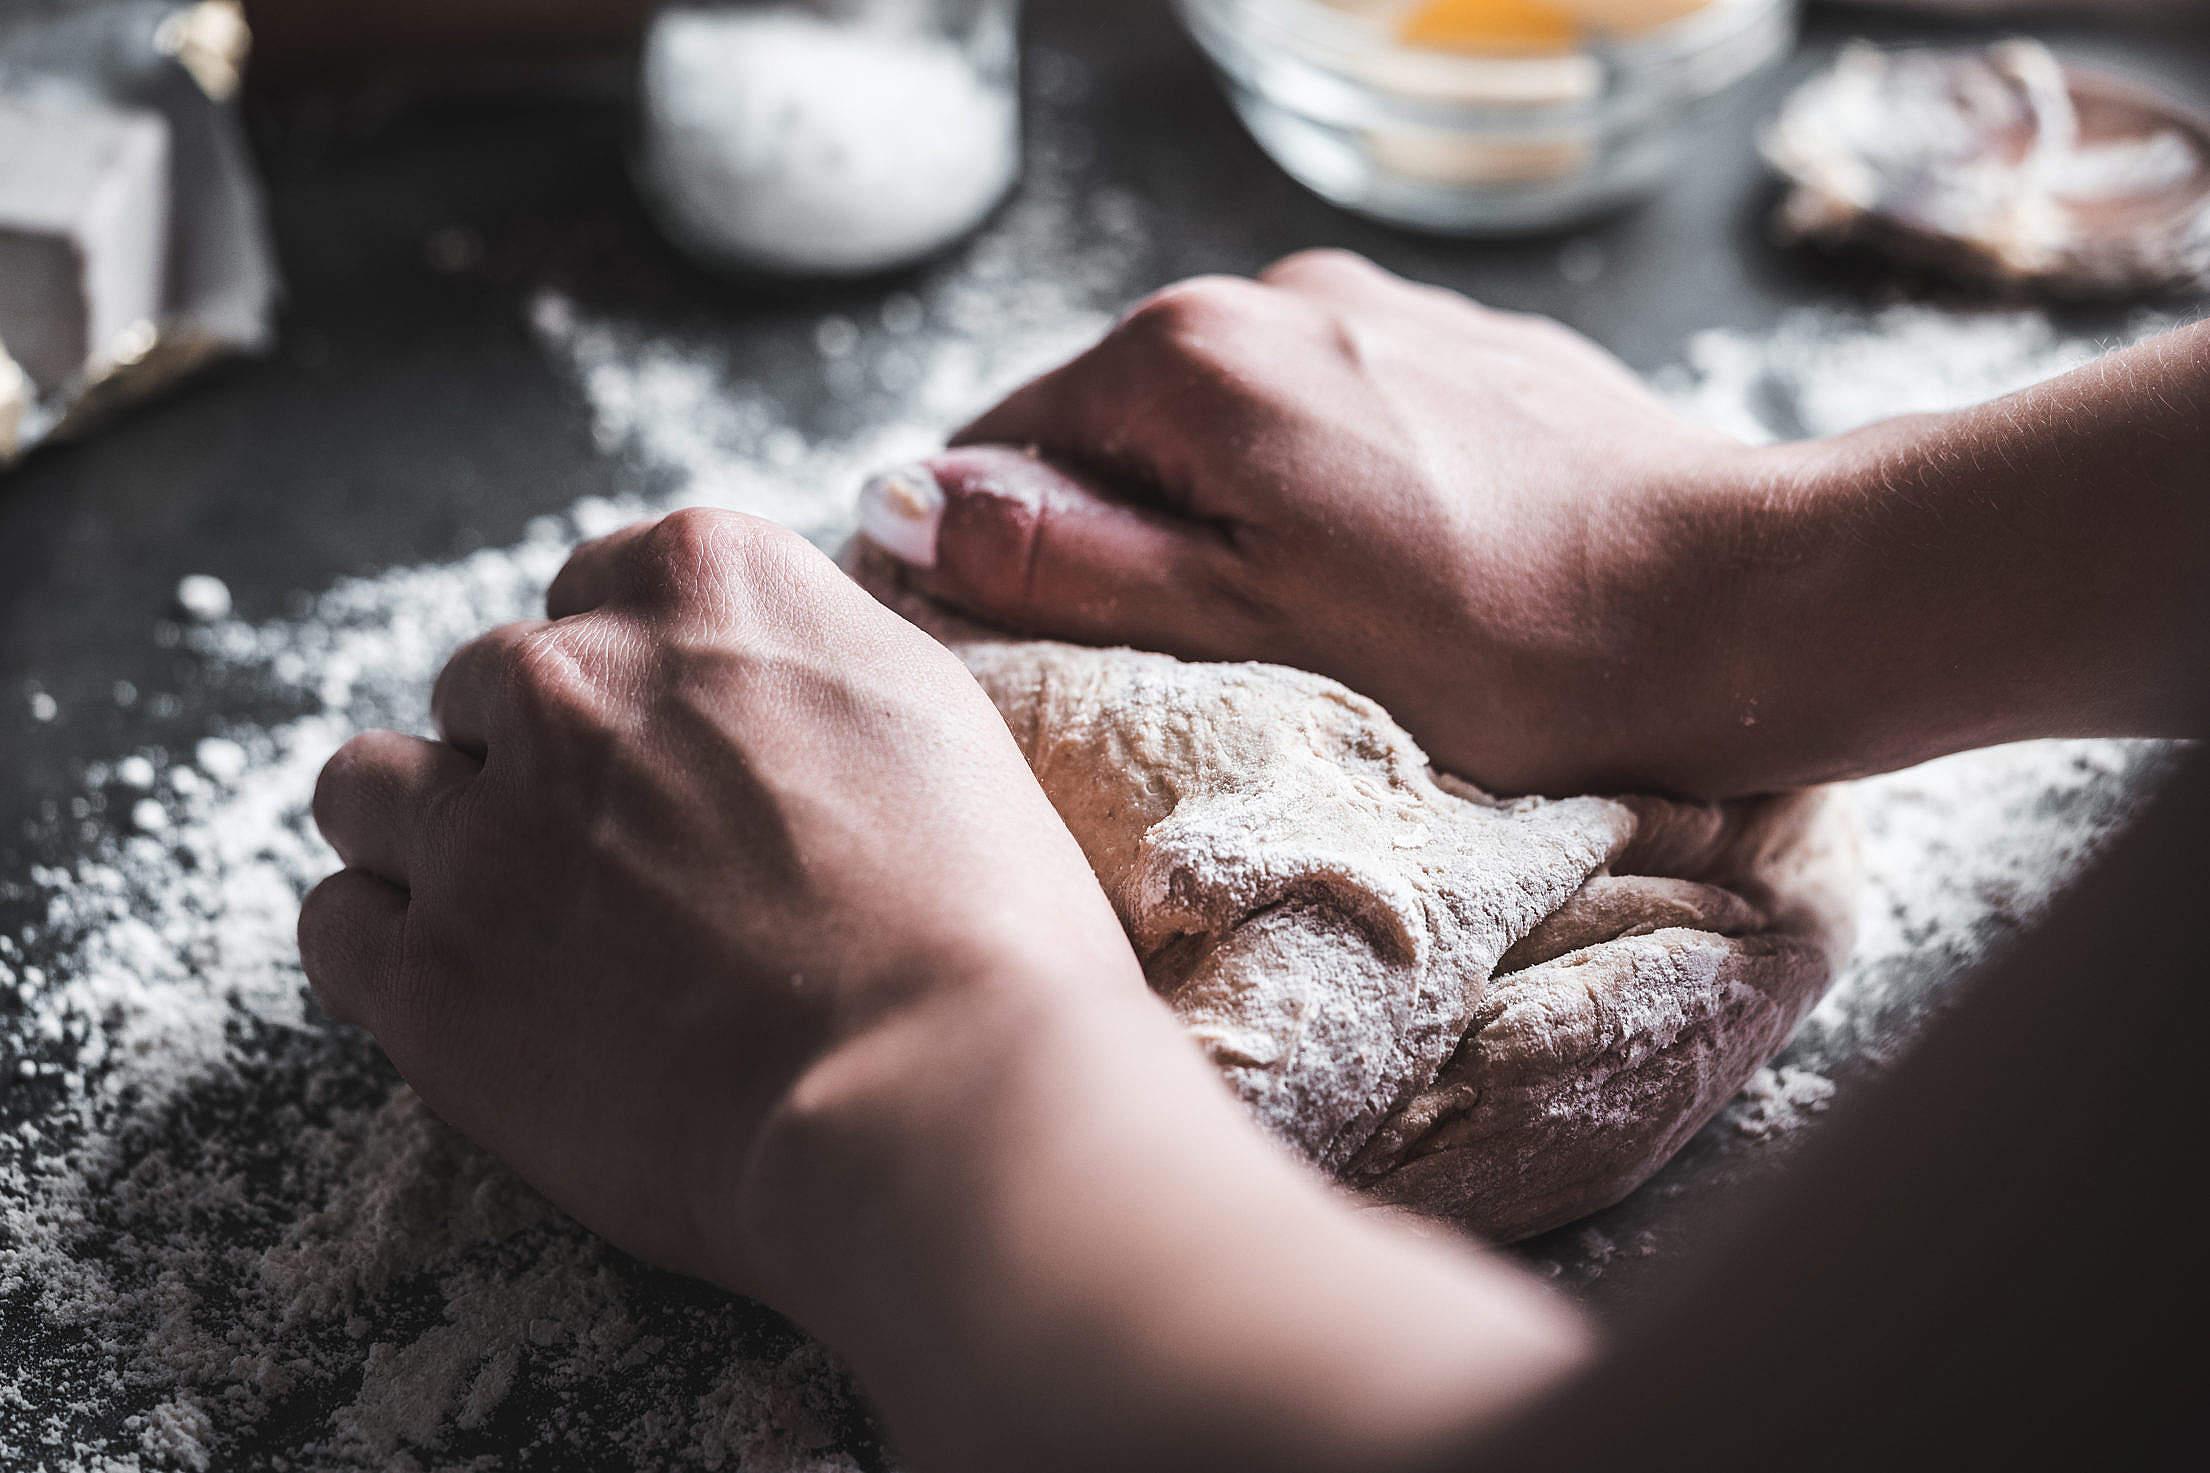 Preparing Dough for Homemade Bread Free Stock Photo